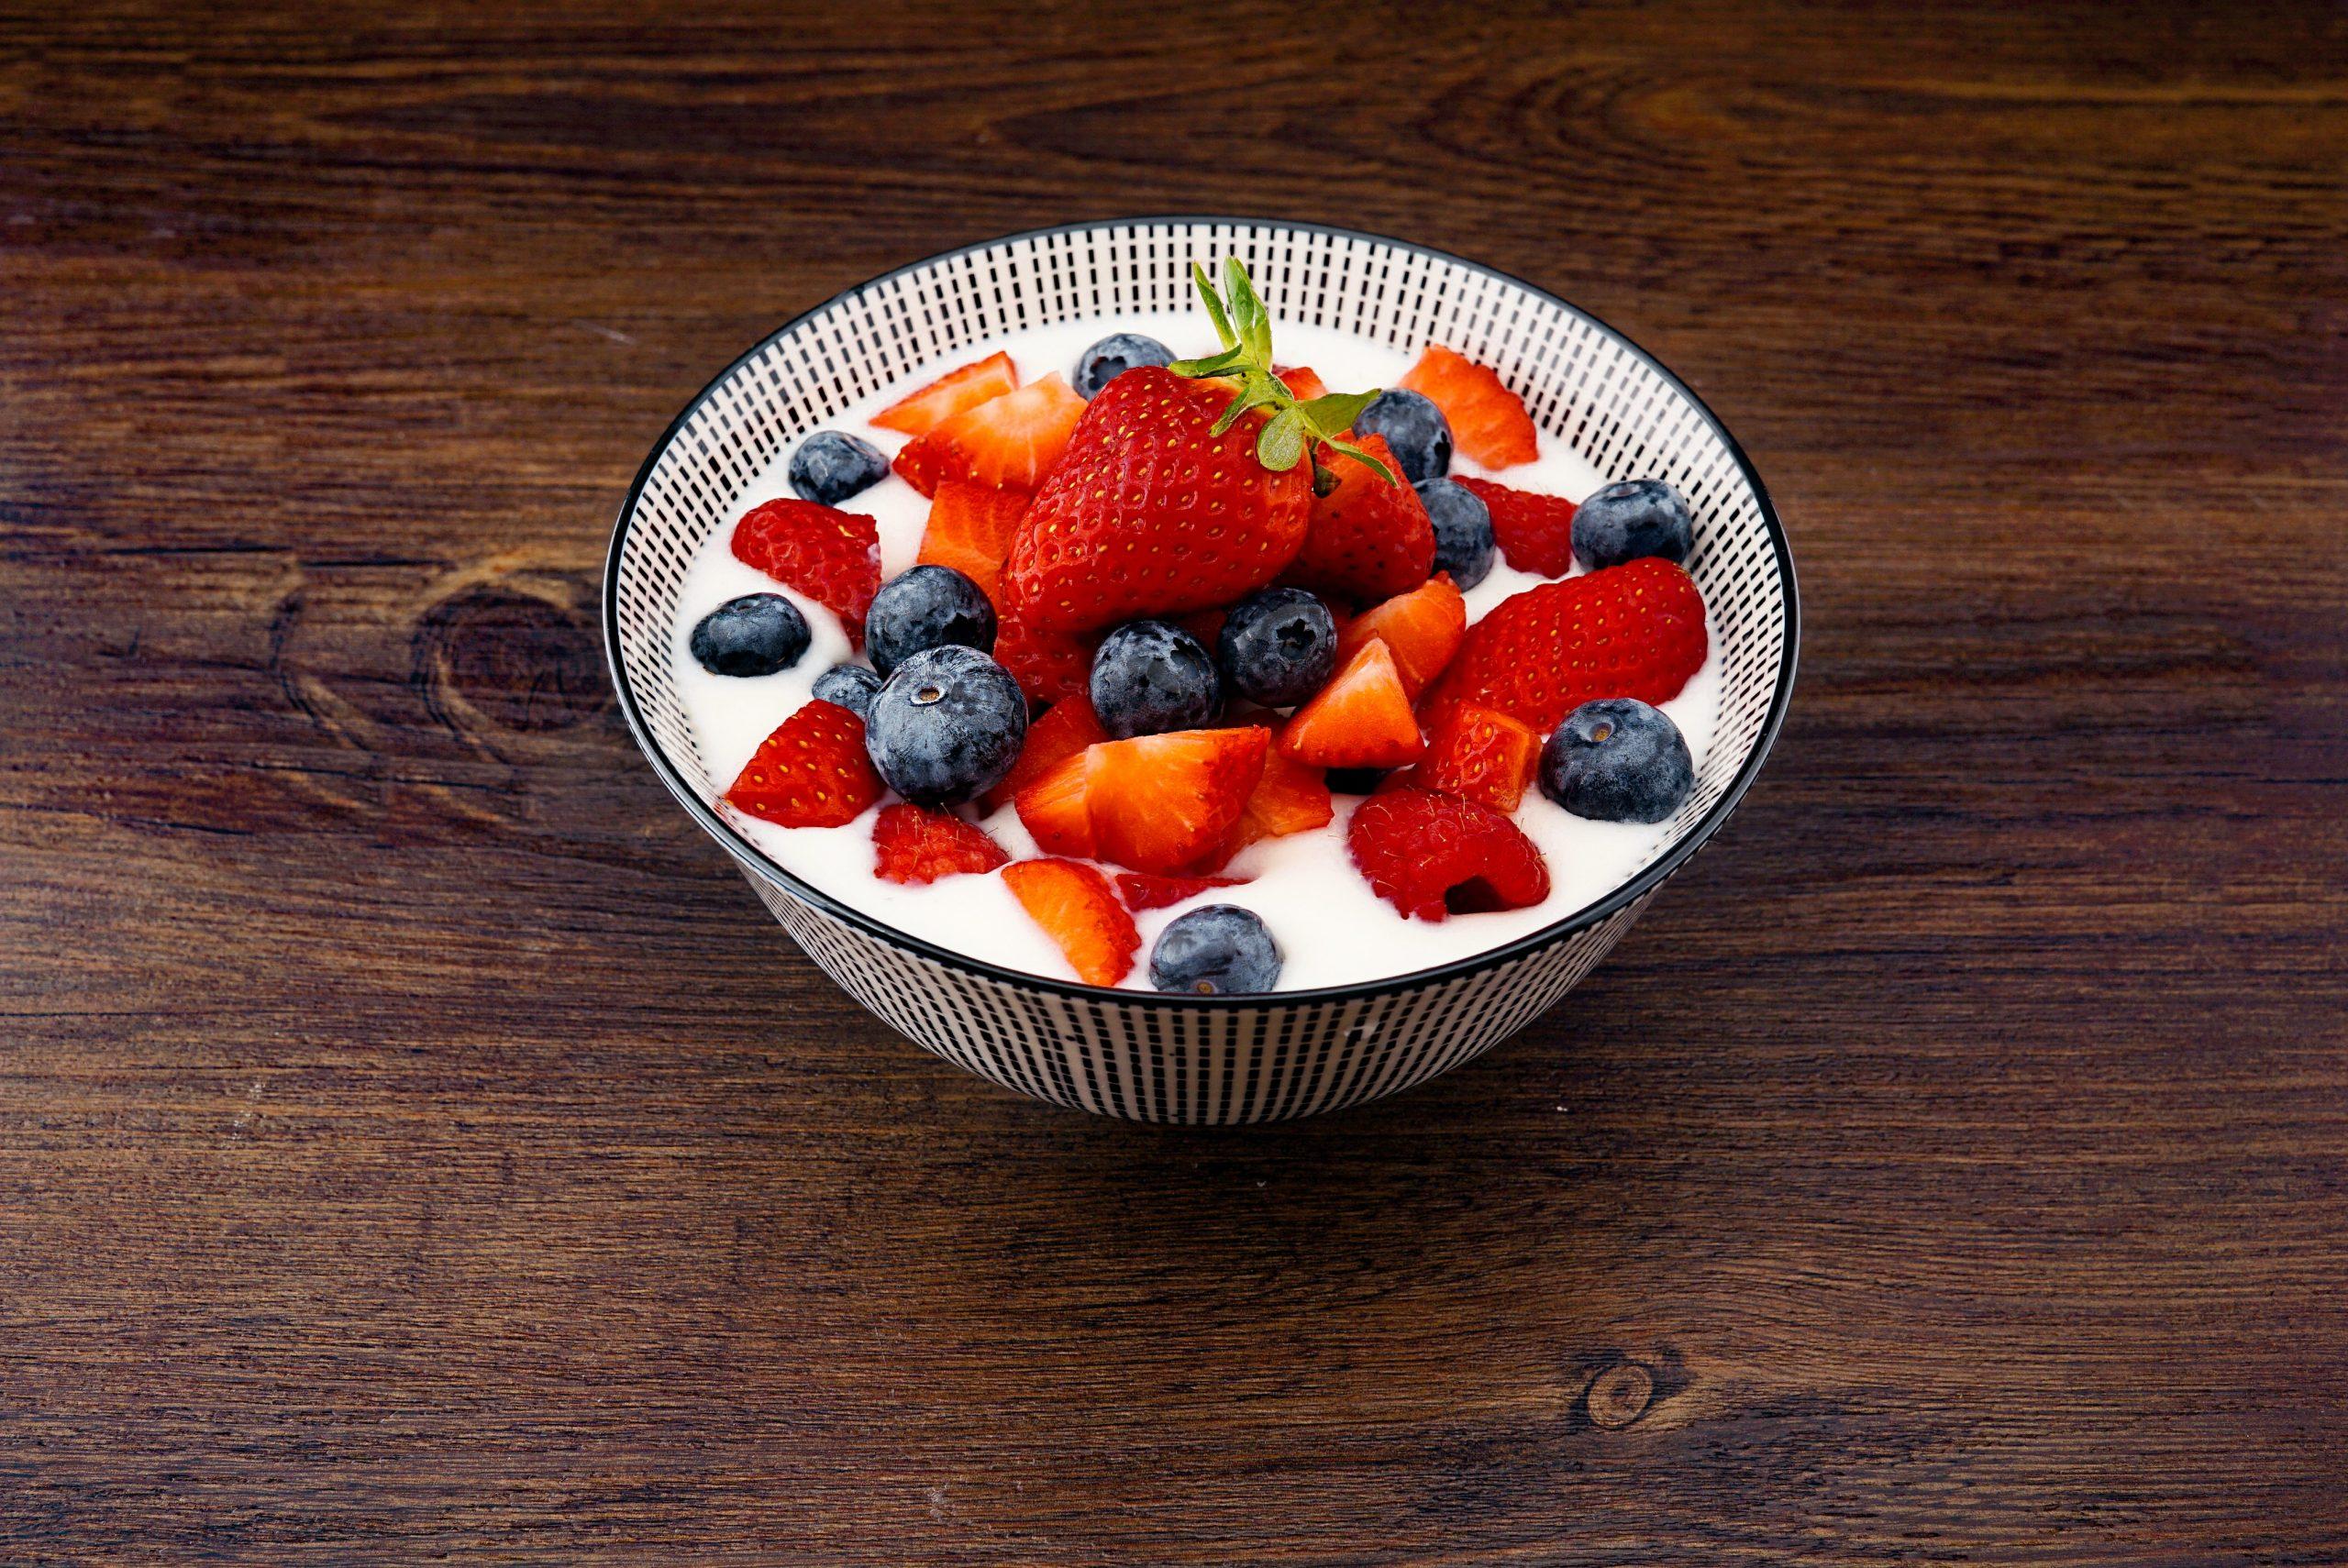 What to do When Easi-Yo (Homemade Yoghurt) Doesn't Work